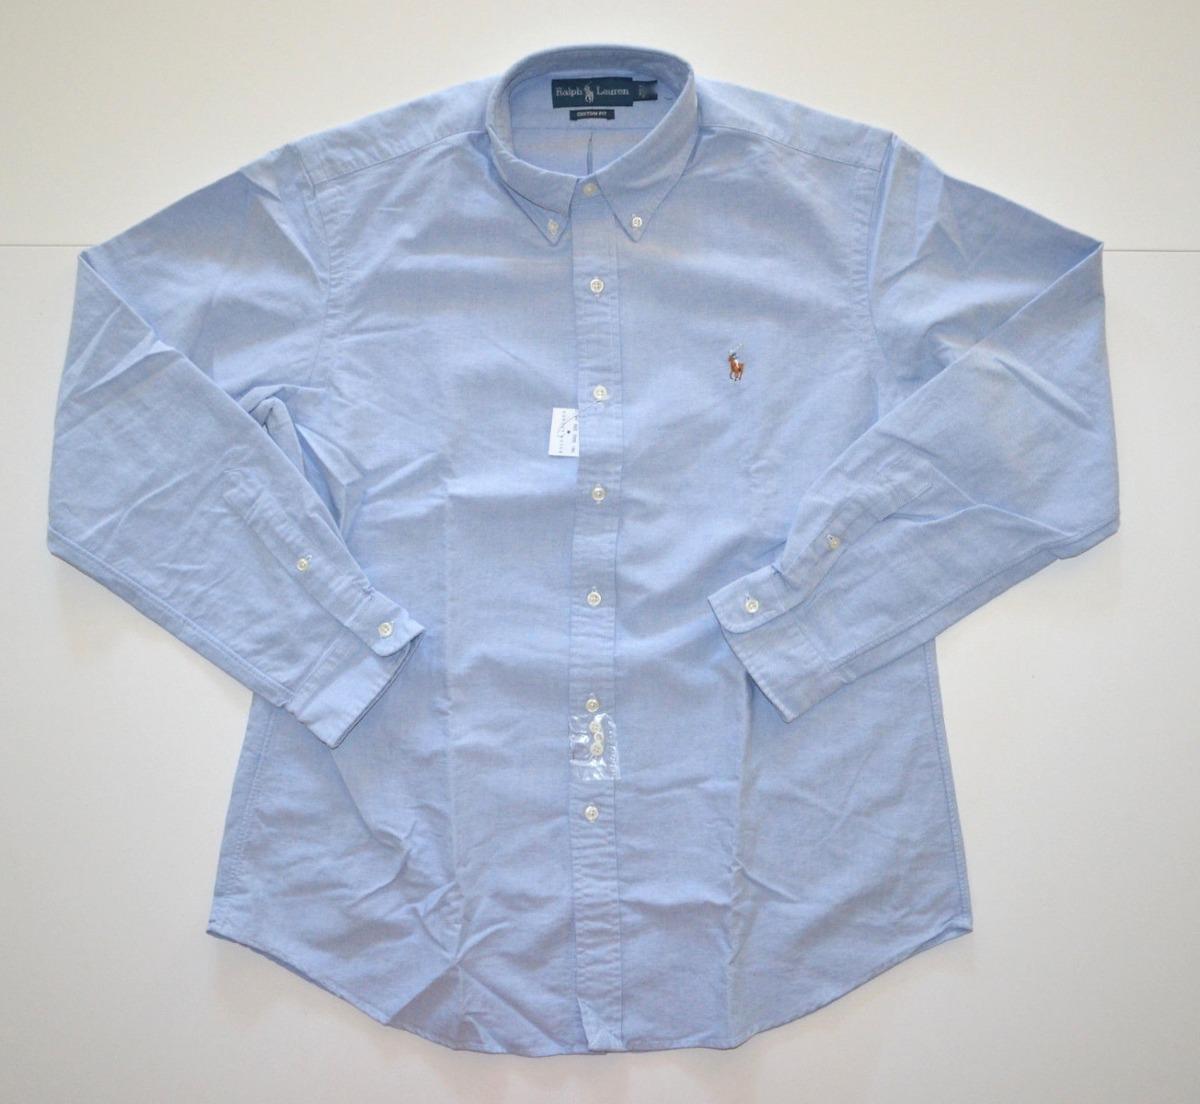 1c55aac3d5646 Camisa Social Polo Ralph Lauren Tamanho Gg Xl Custom Fit - R  199